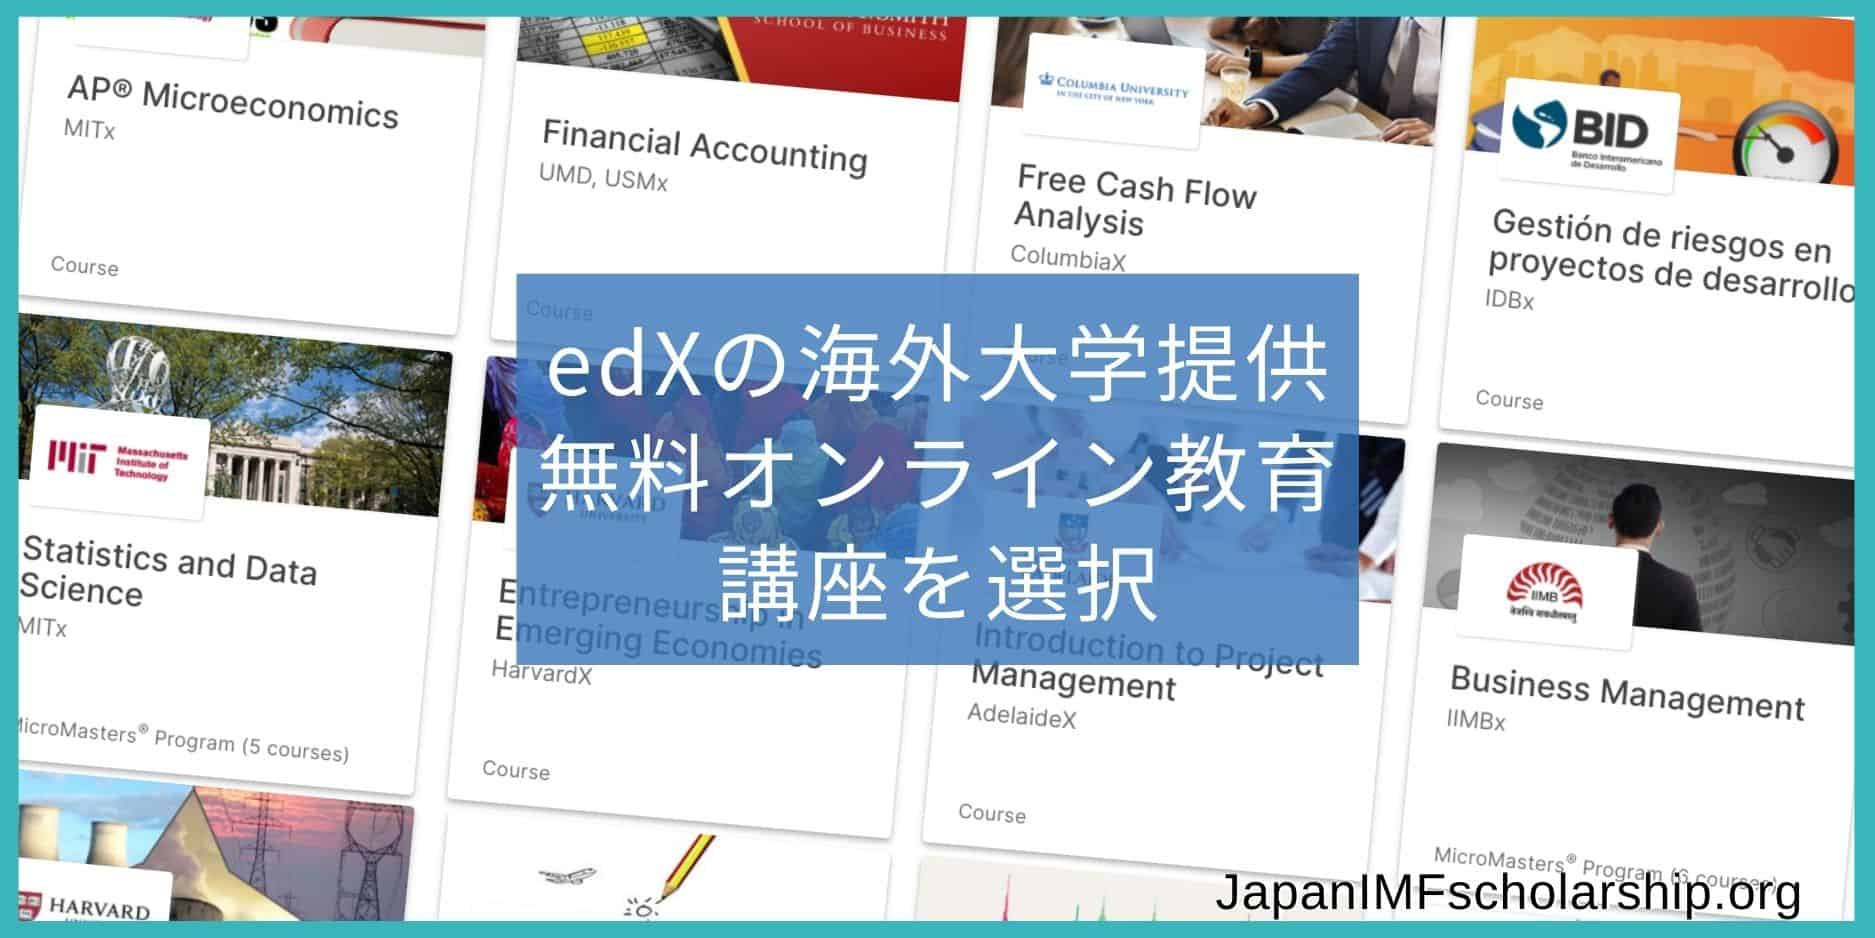 jisp edx university free online economics and finance courses